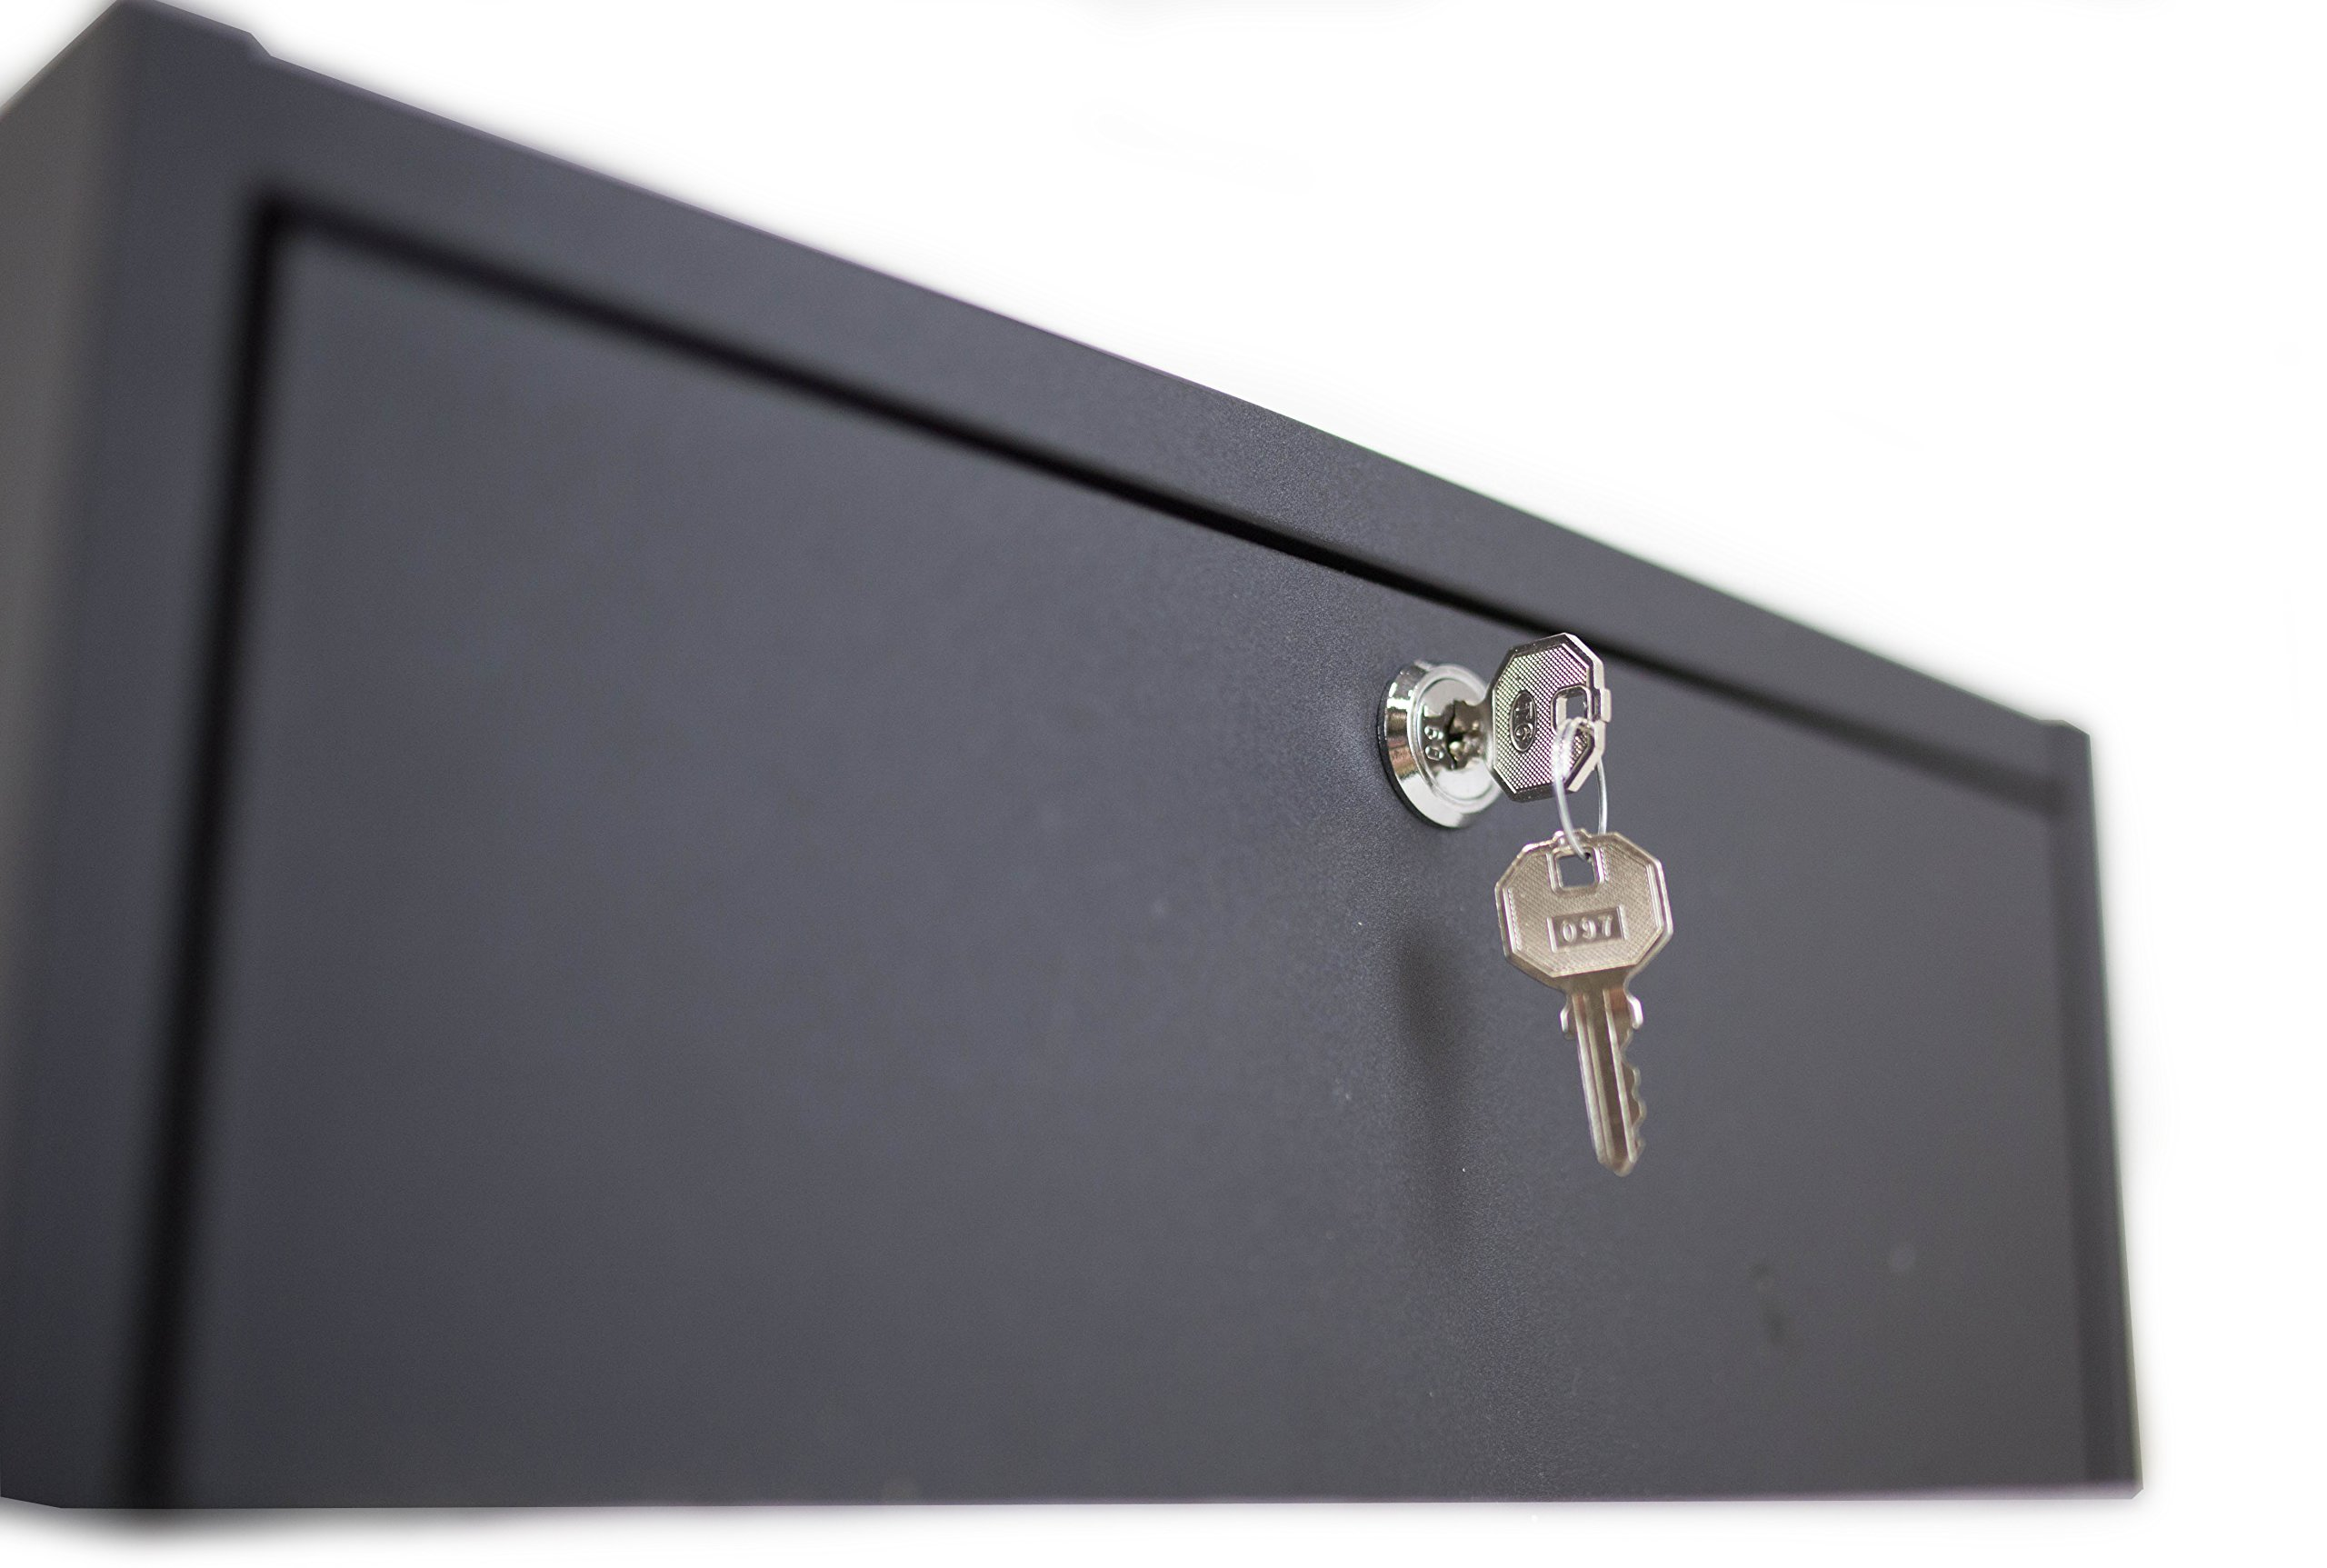 WEN 31169 Industrial Strength Steel Work Bench Drawer by WEN (Image #2)